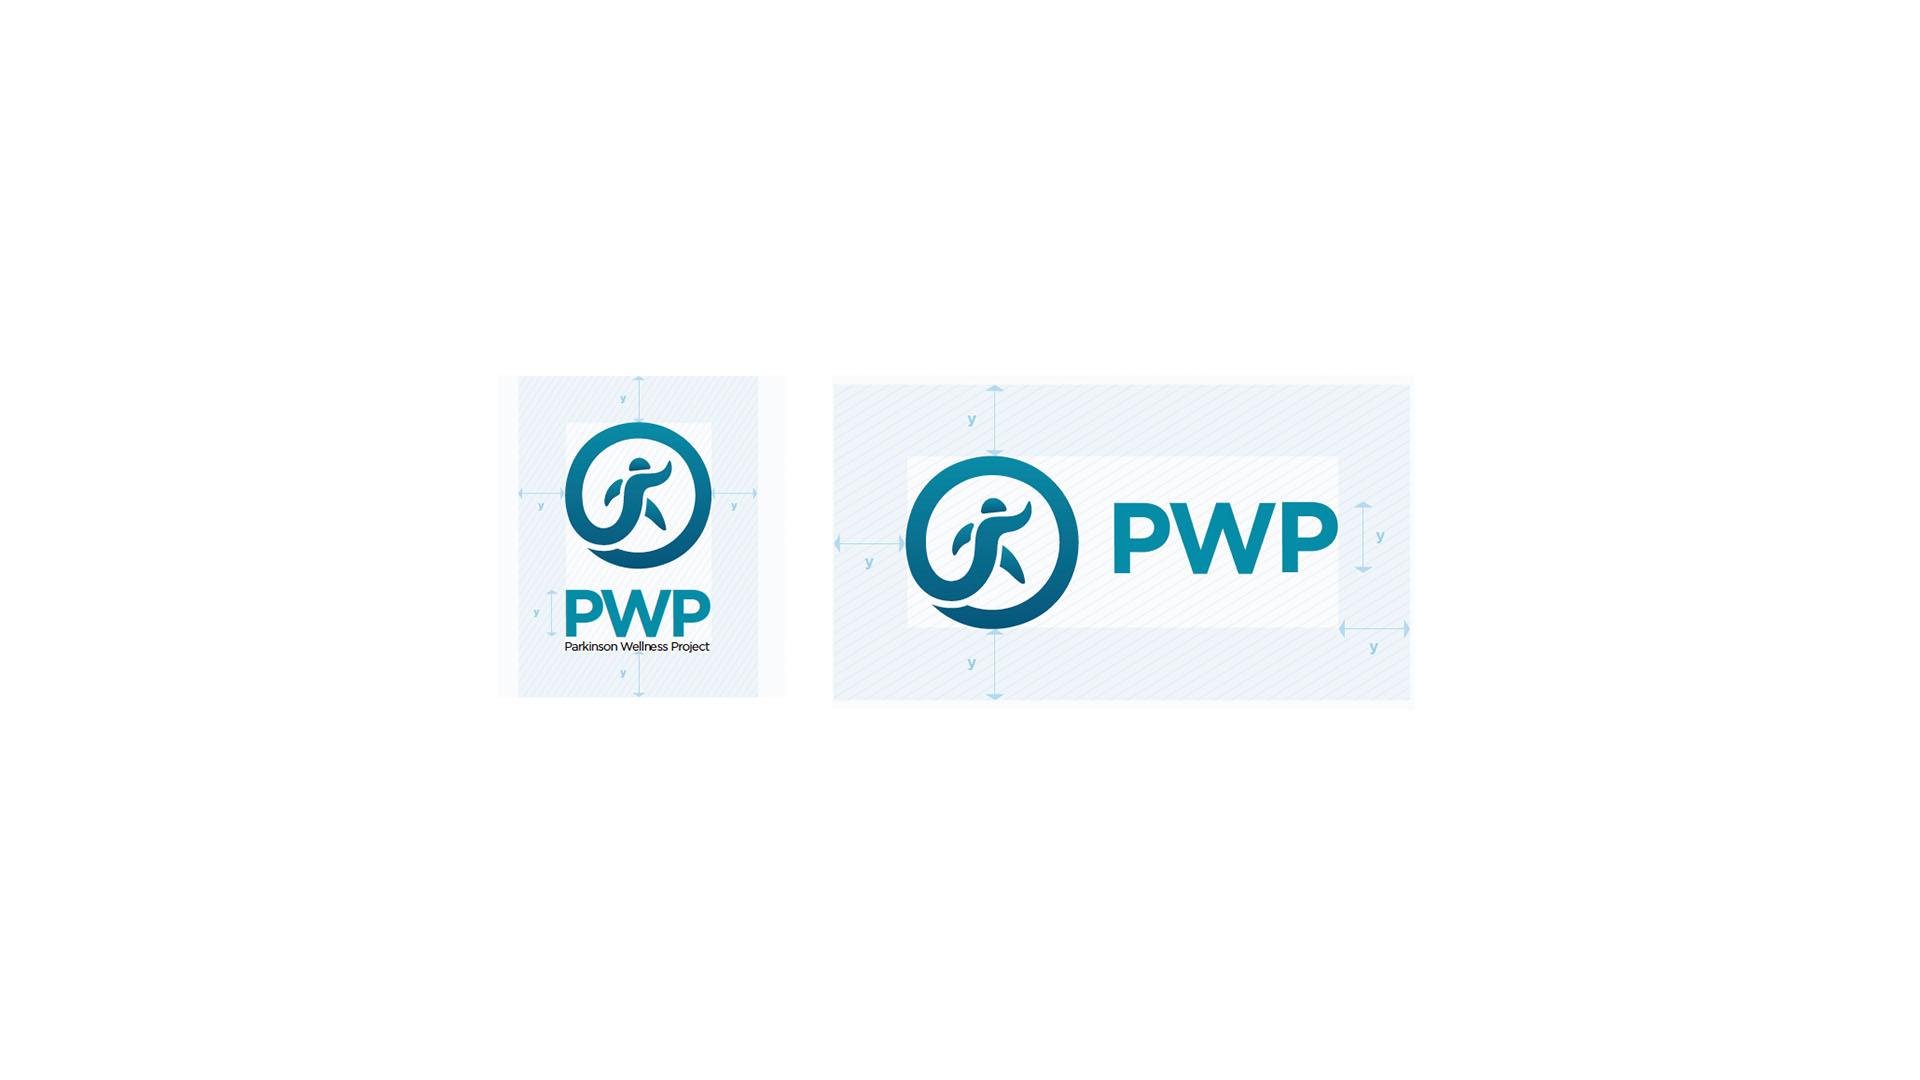 PWP-06.jpg